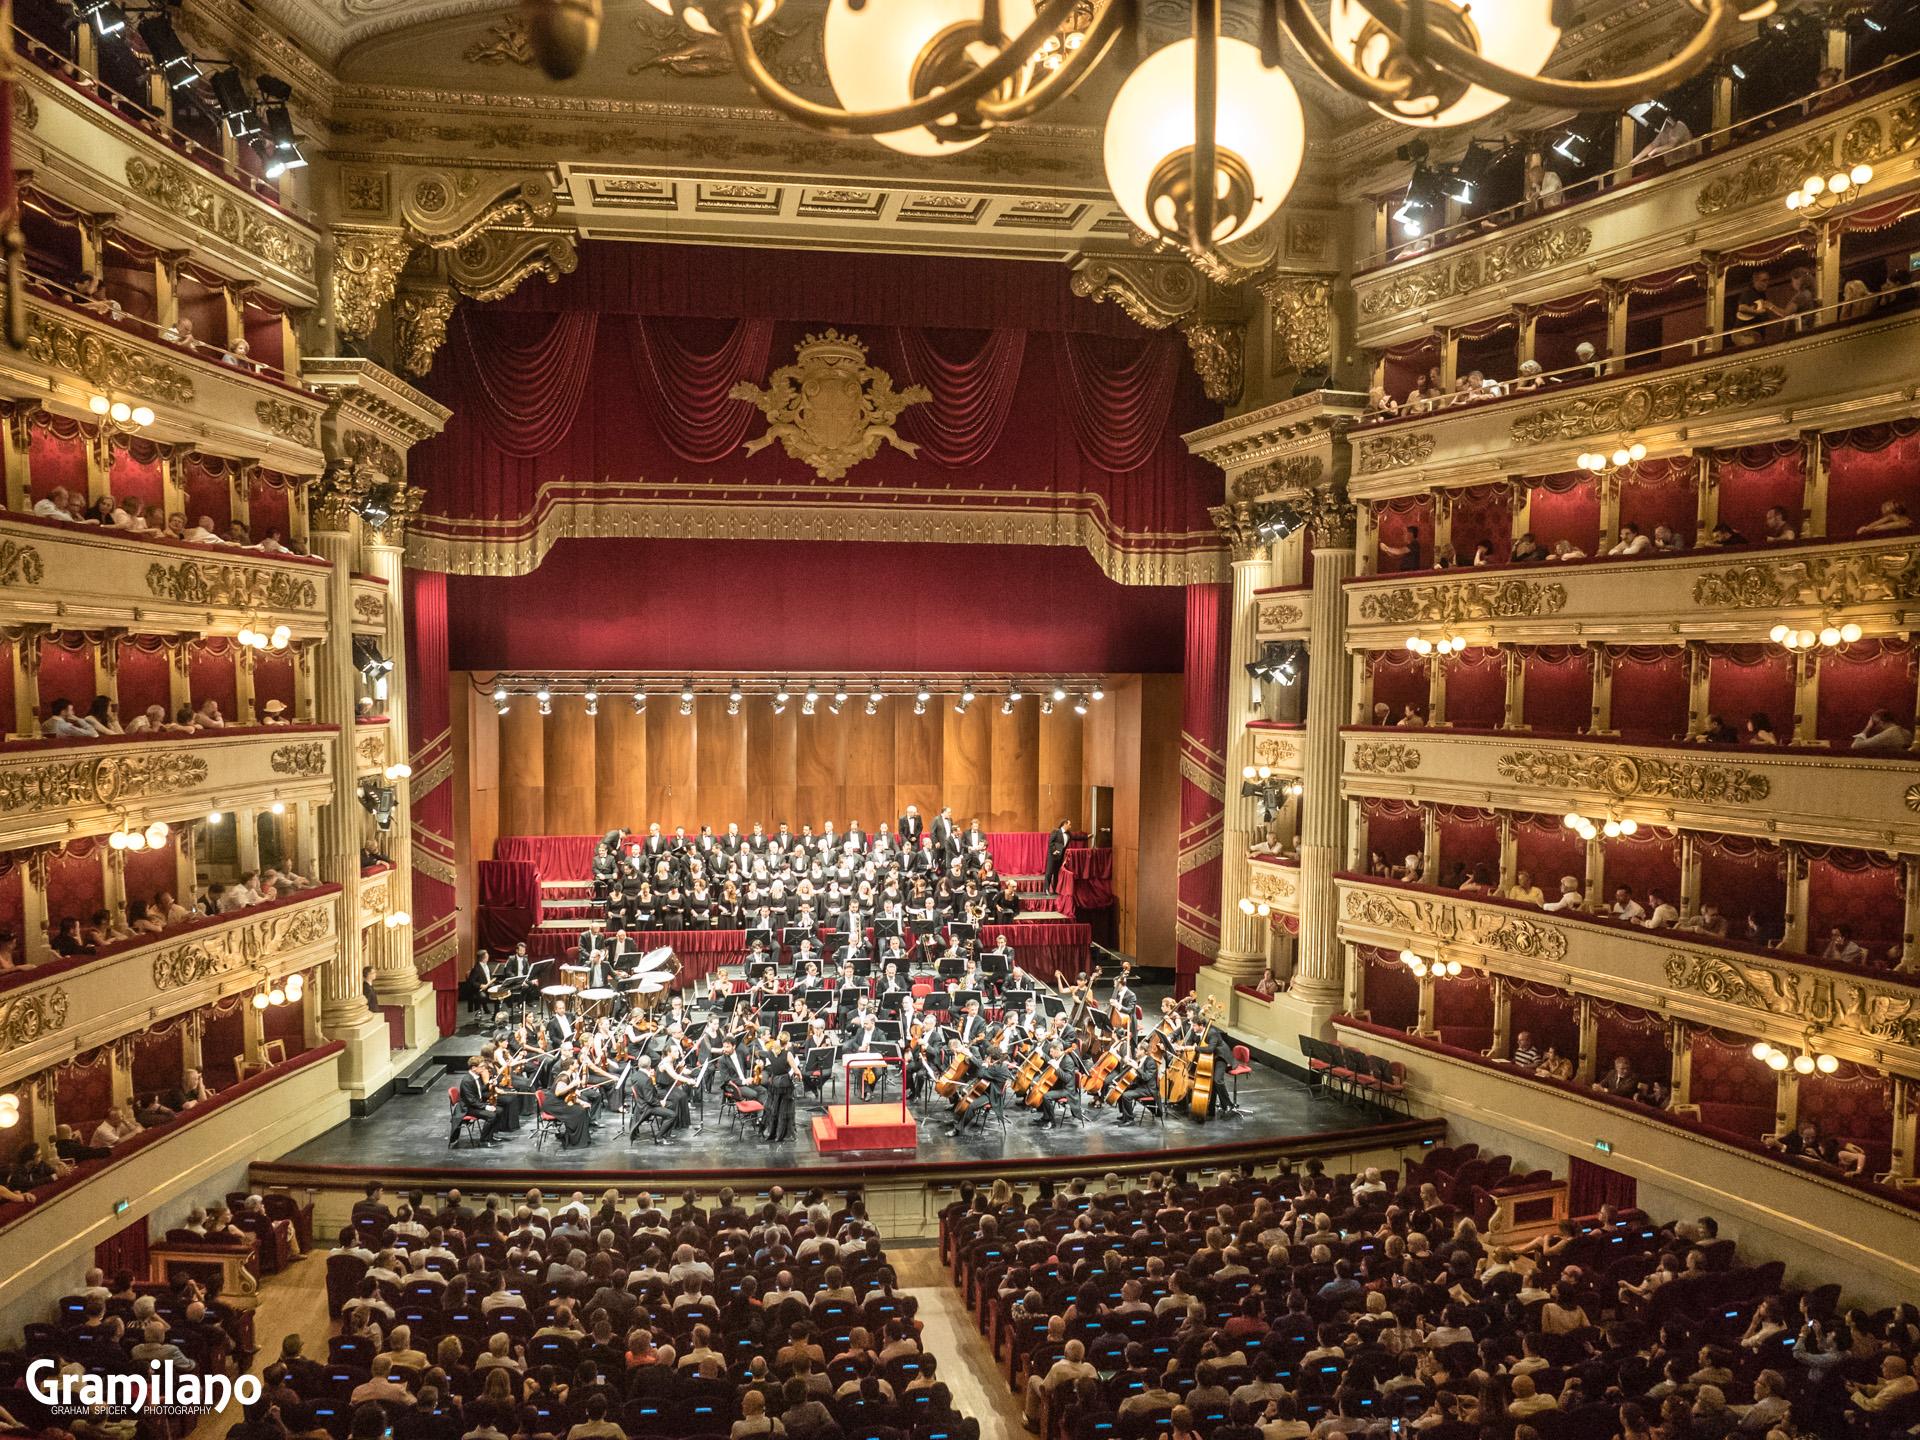 Concert, La Scala, Milan